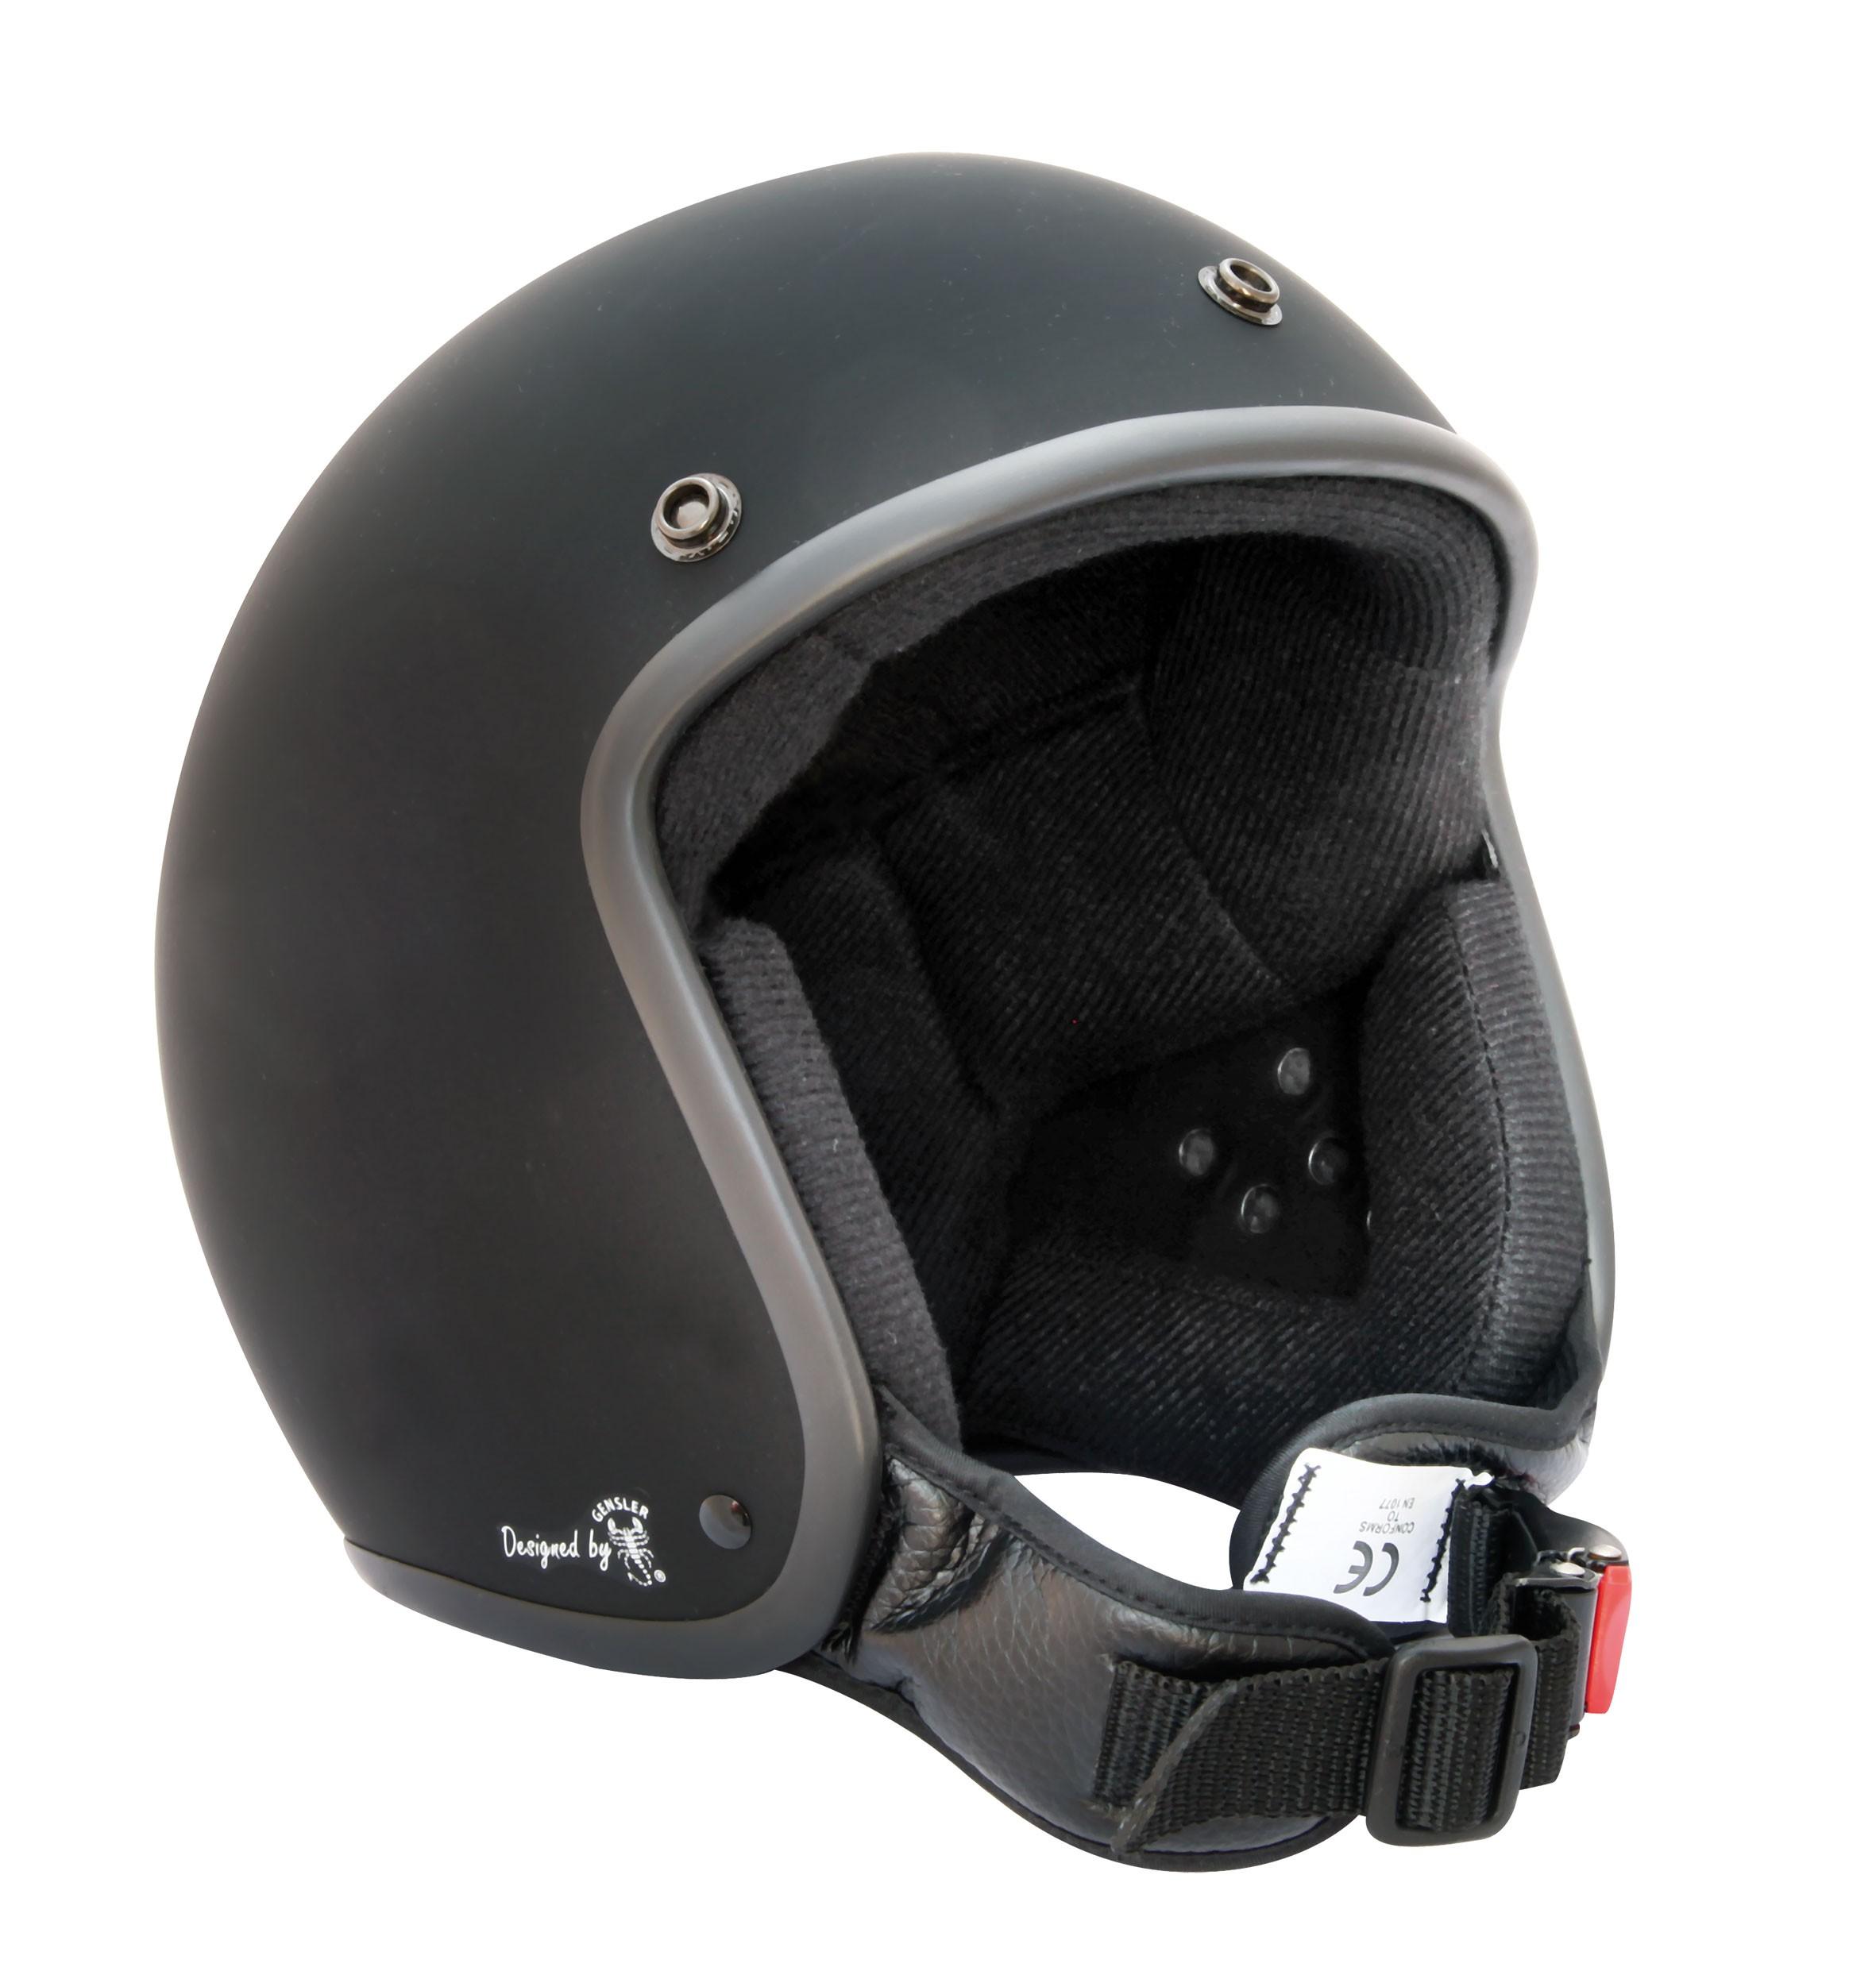 Bores Motorrad Helm Bogo 3 Jethelm glänzend Black